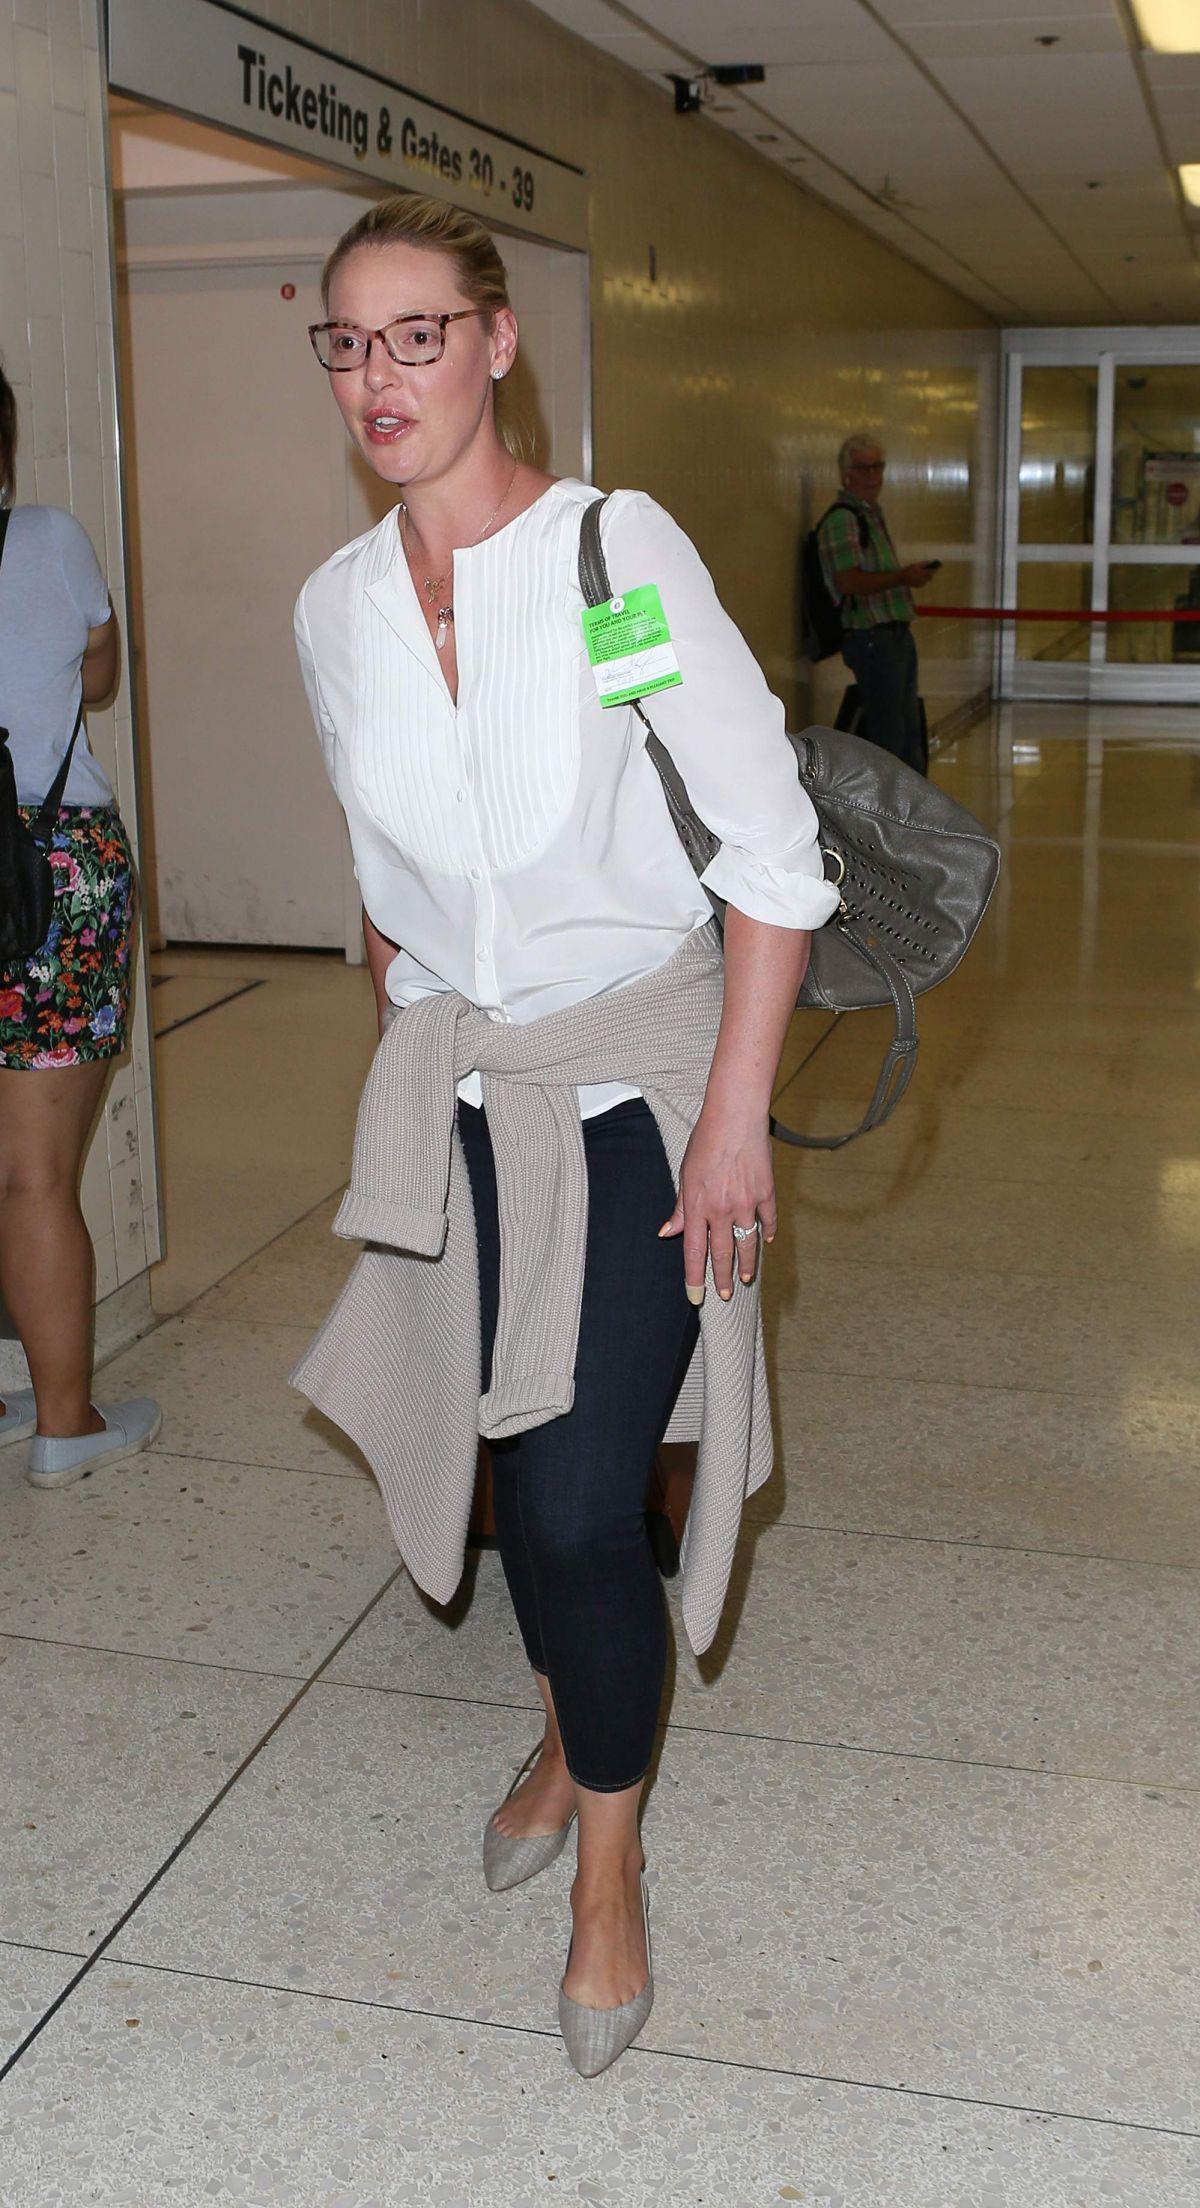 KATHERINE HEIGL at Los Angeles International Airport 07/10/2017